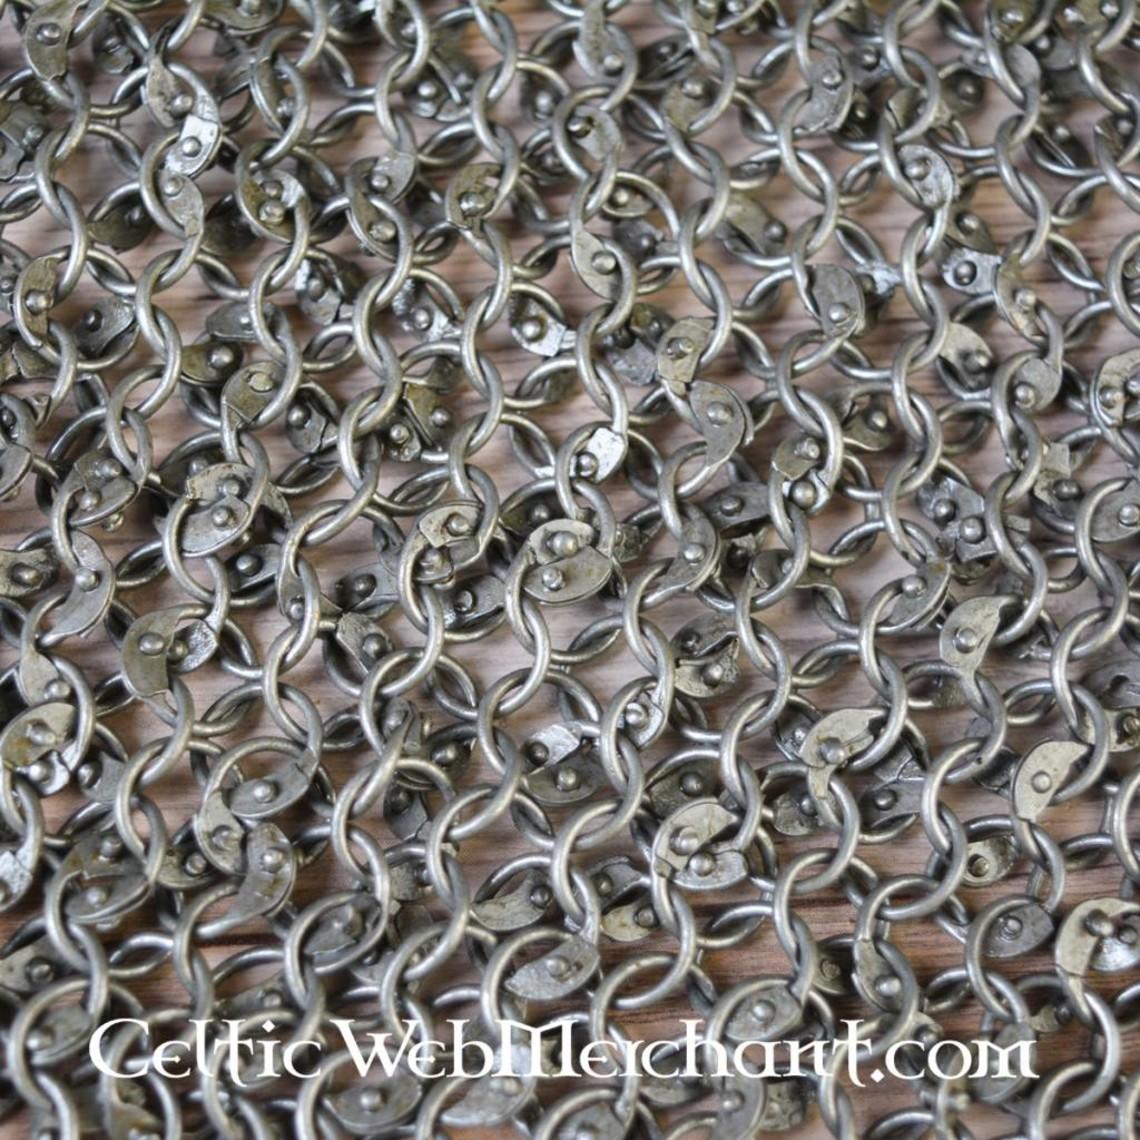 Ulfberth Colletin, anneaux ronds - rivets ronds, 8 mm